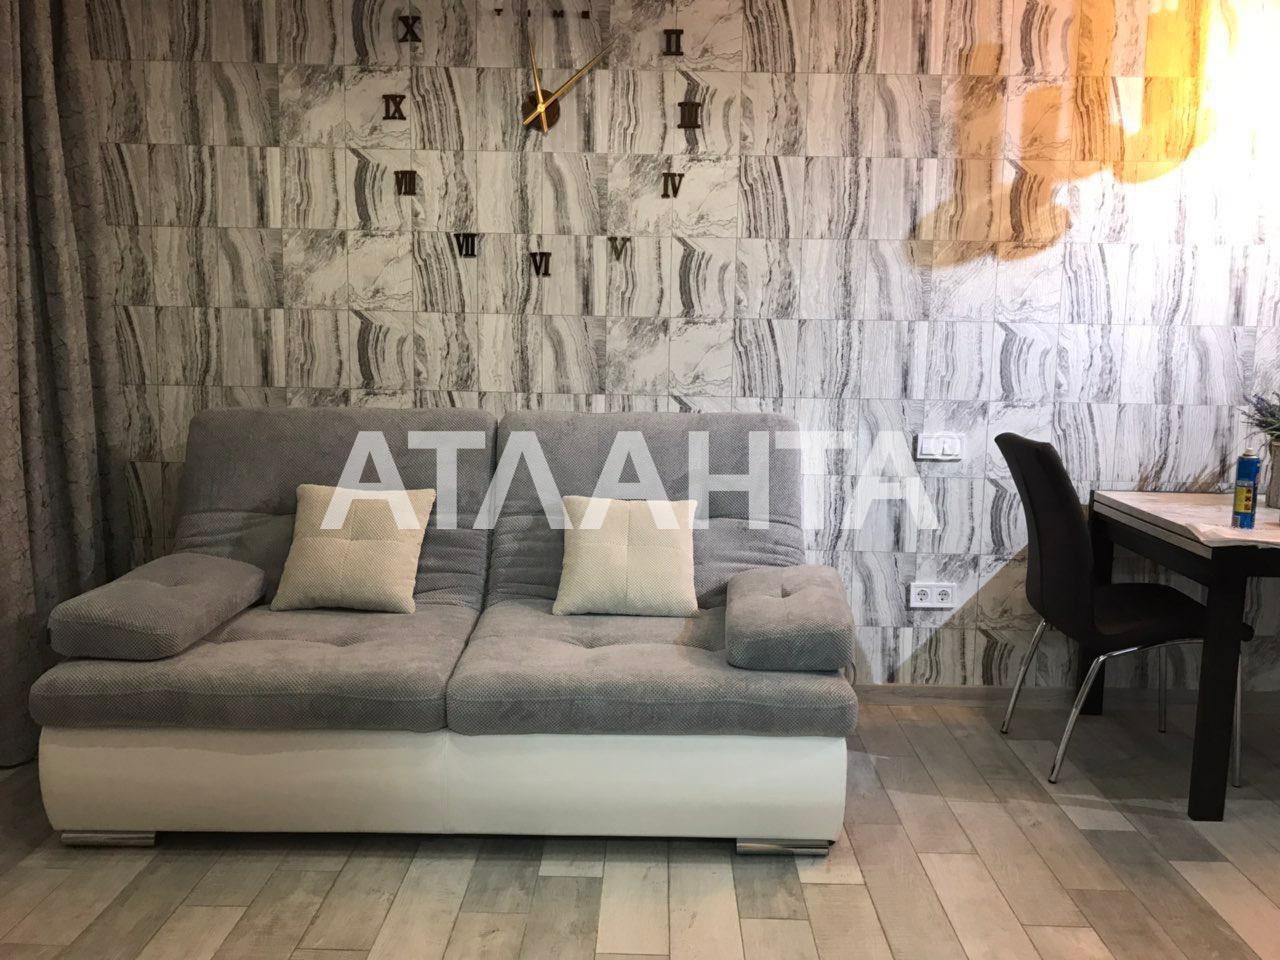 Продается 1-комнатная Квартира на ул. Генуэзская — 68 000 у.е. (фото №4)